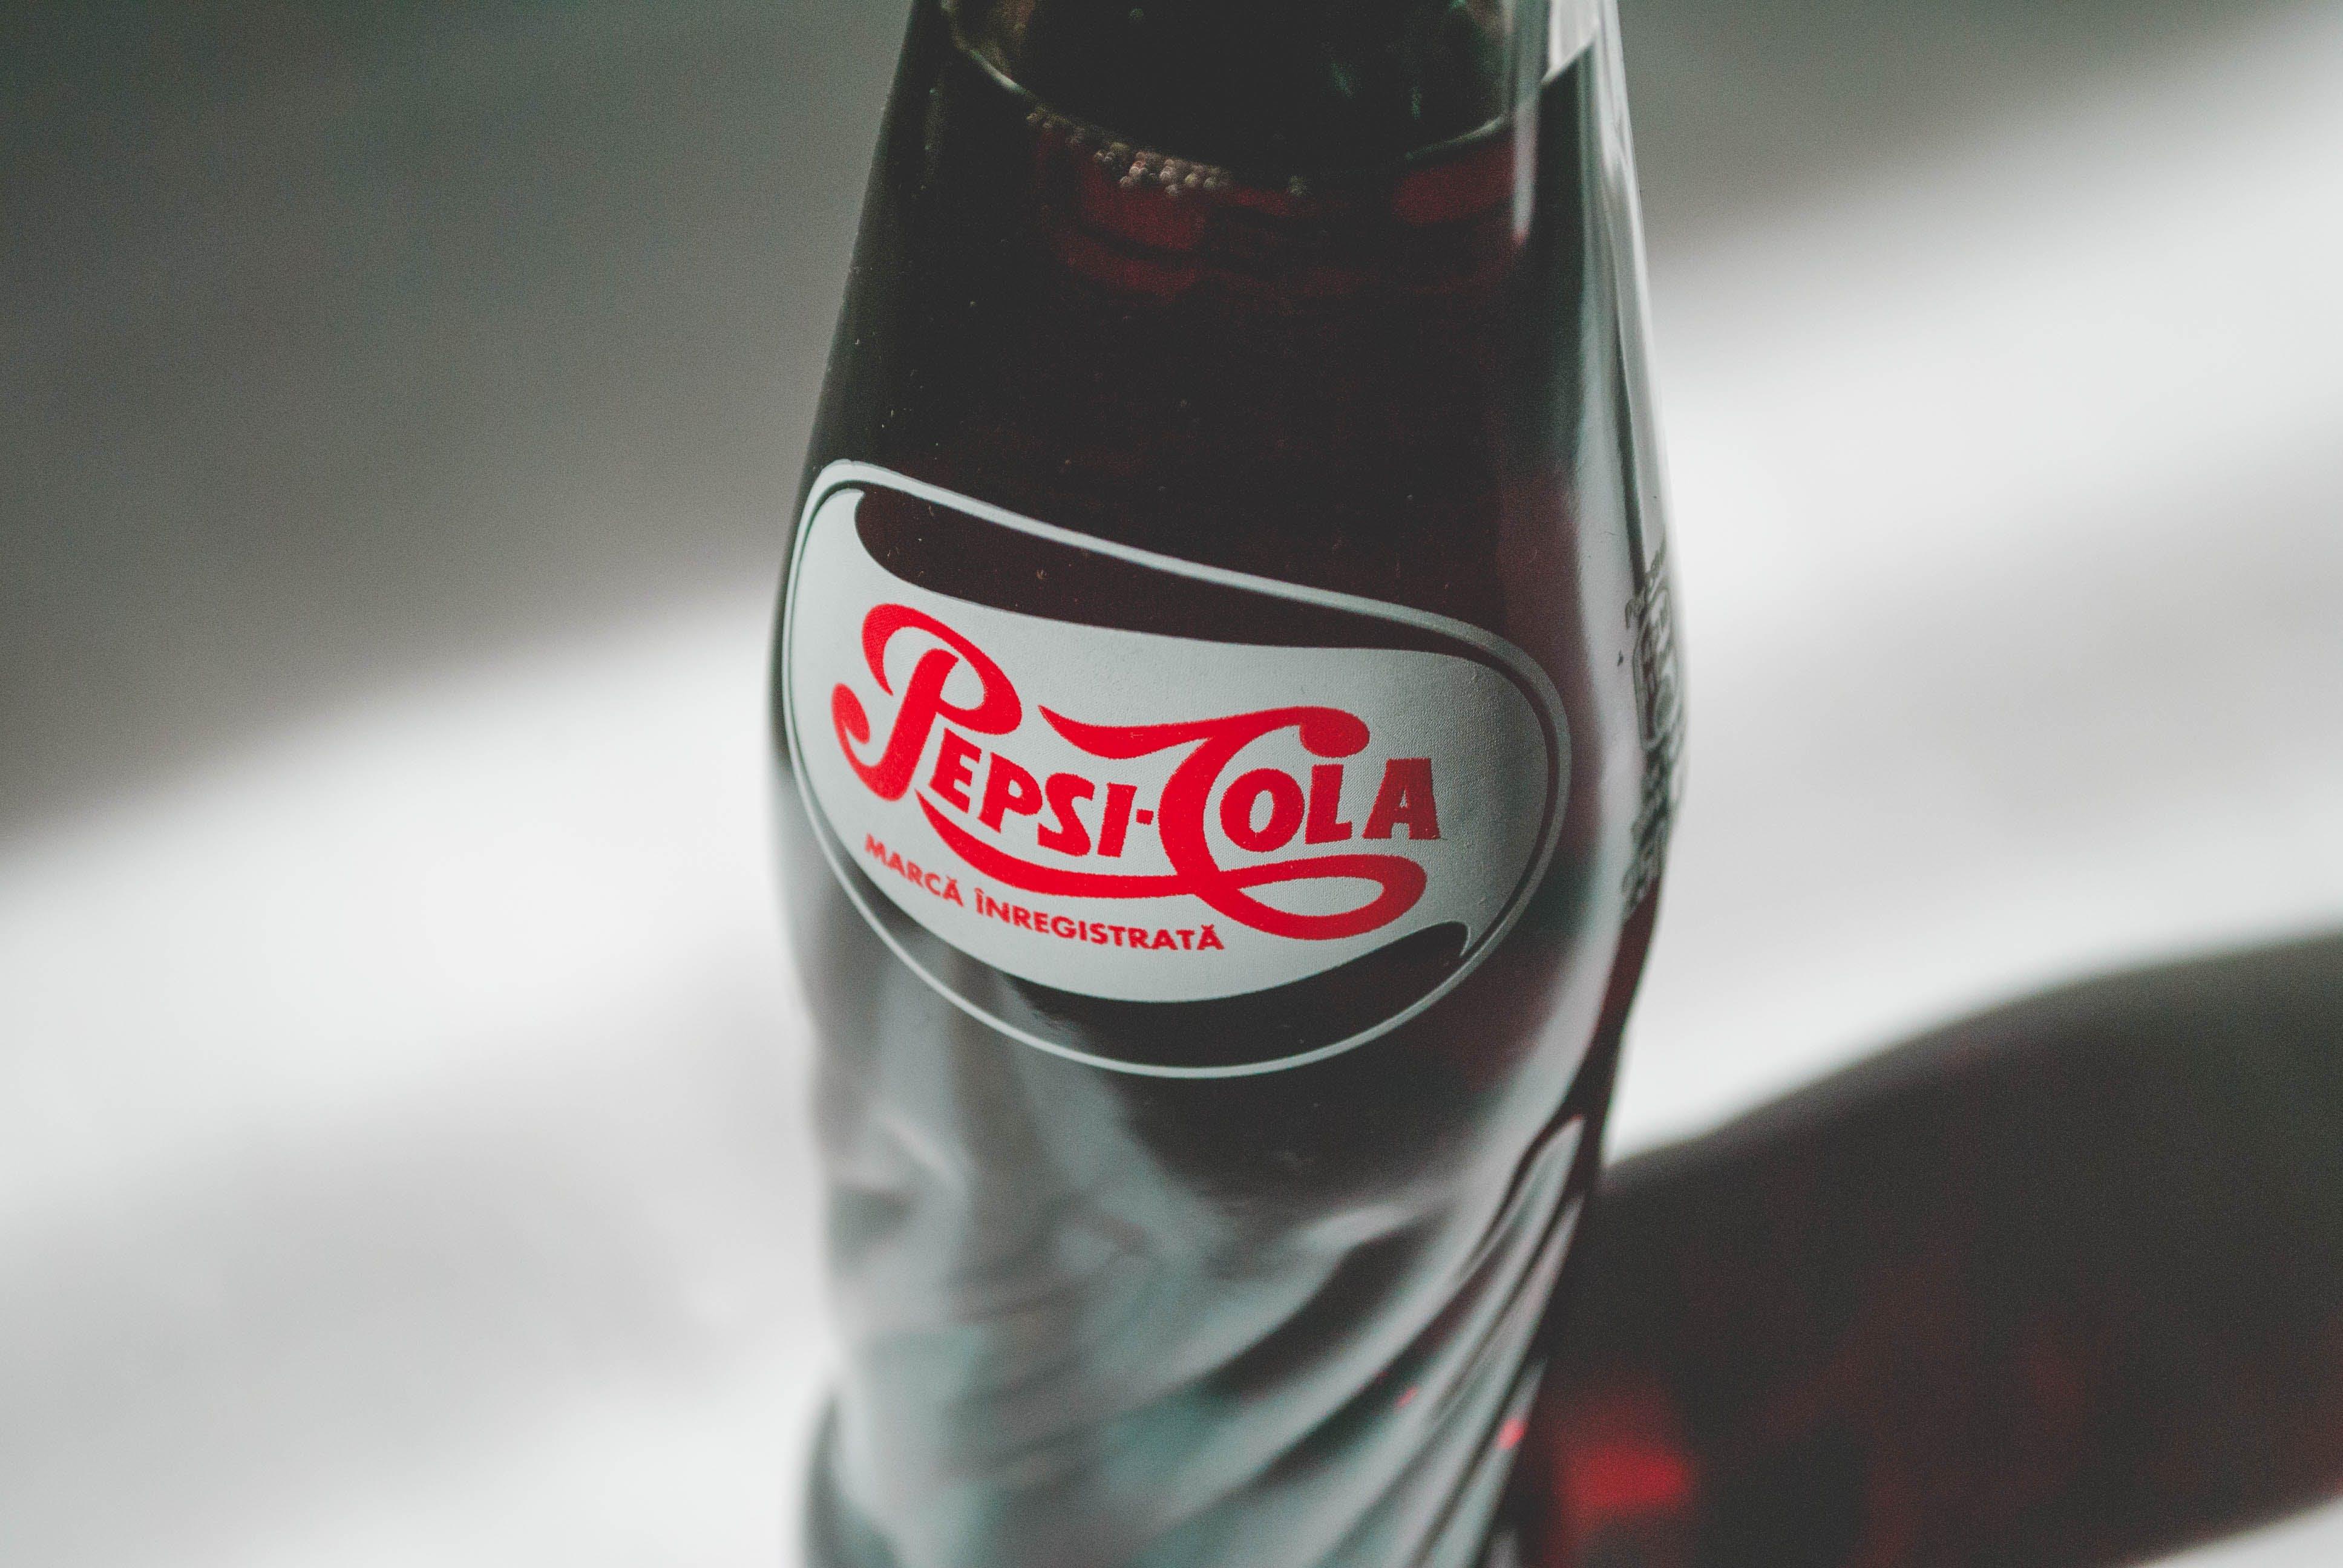 Pepsi-cola Bottle